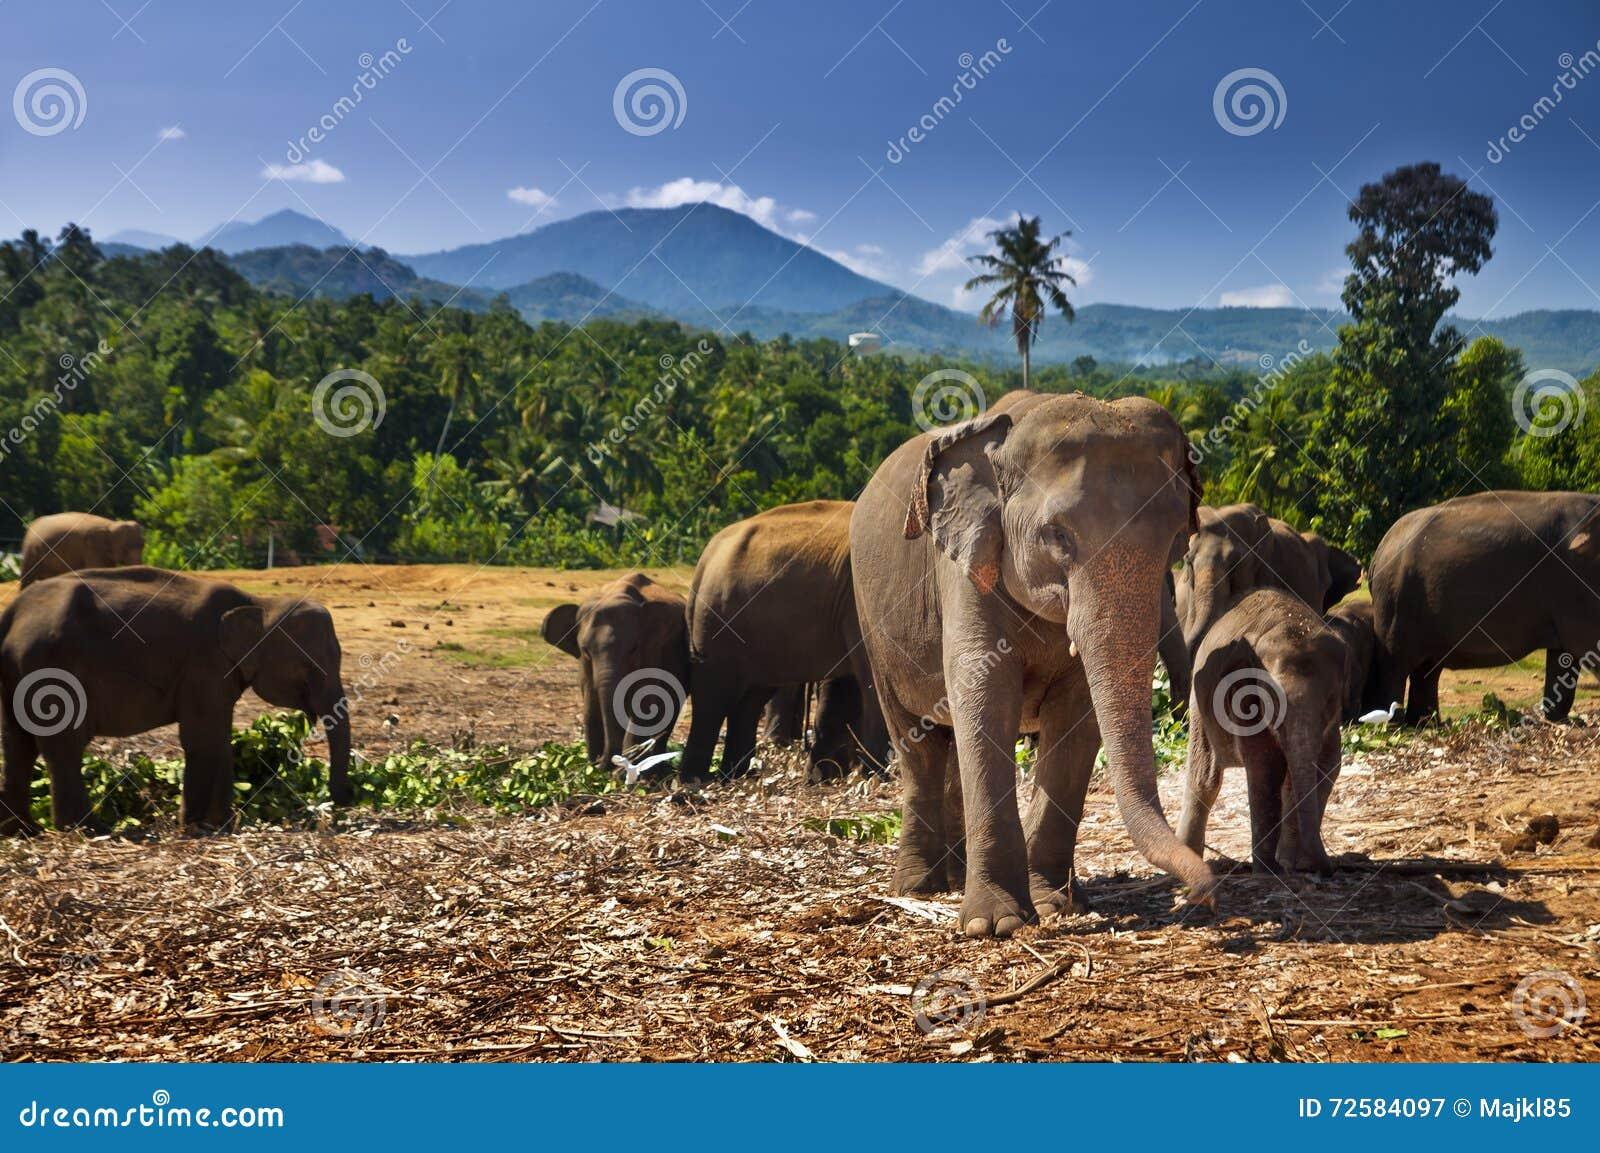 Elephant herd, Sri Lanka